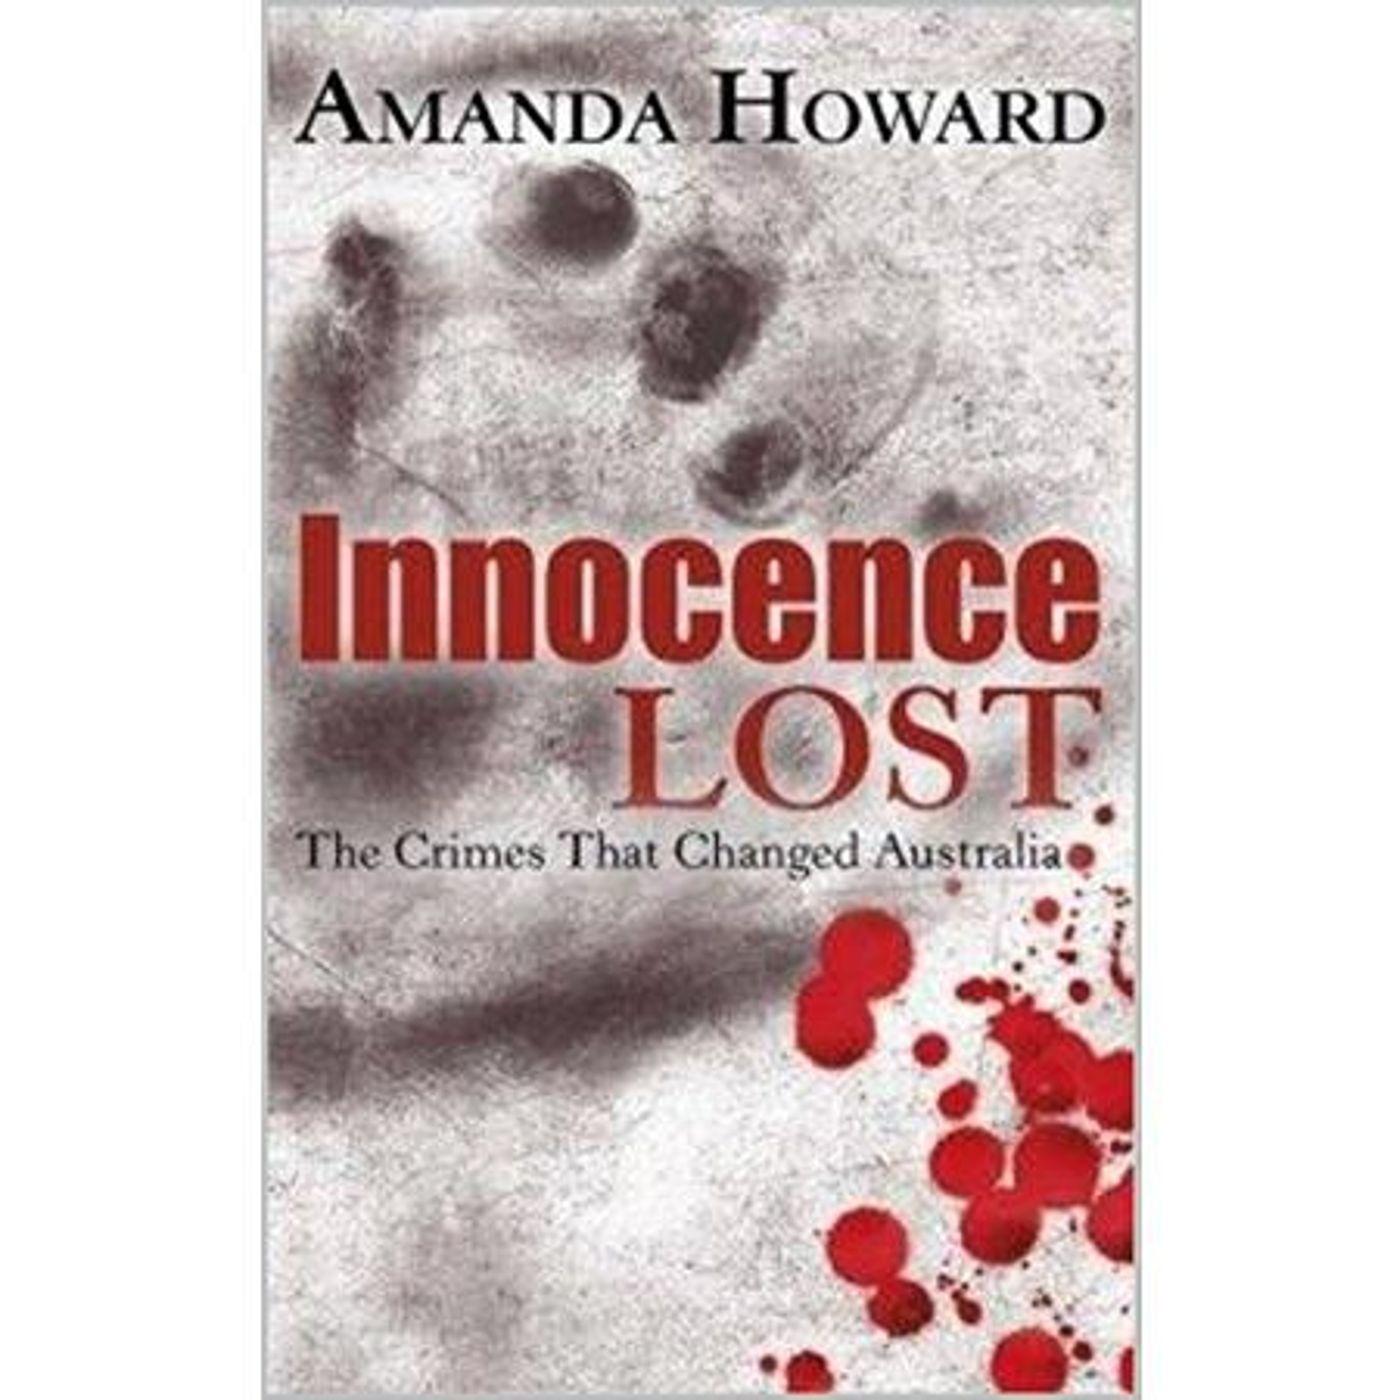 INNOCENCE LOST-The Crimes That Changed Australia-Amanda Howard